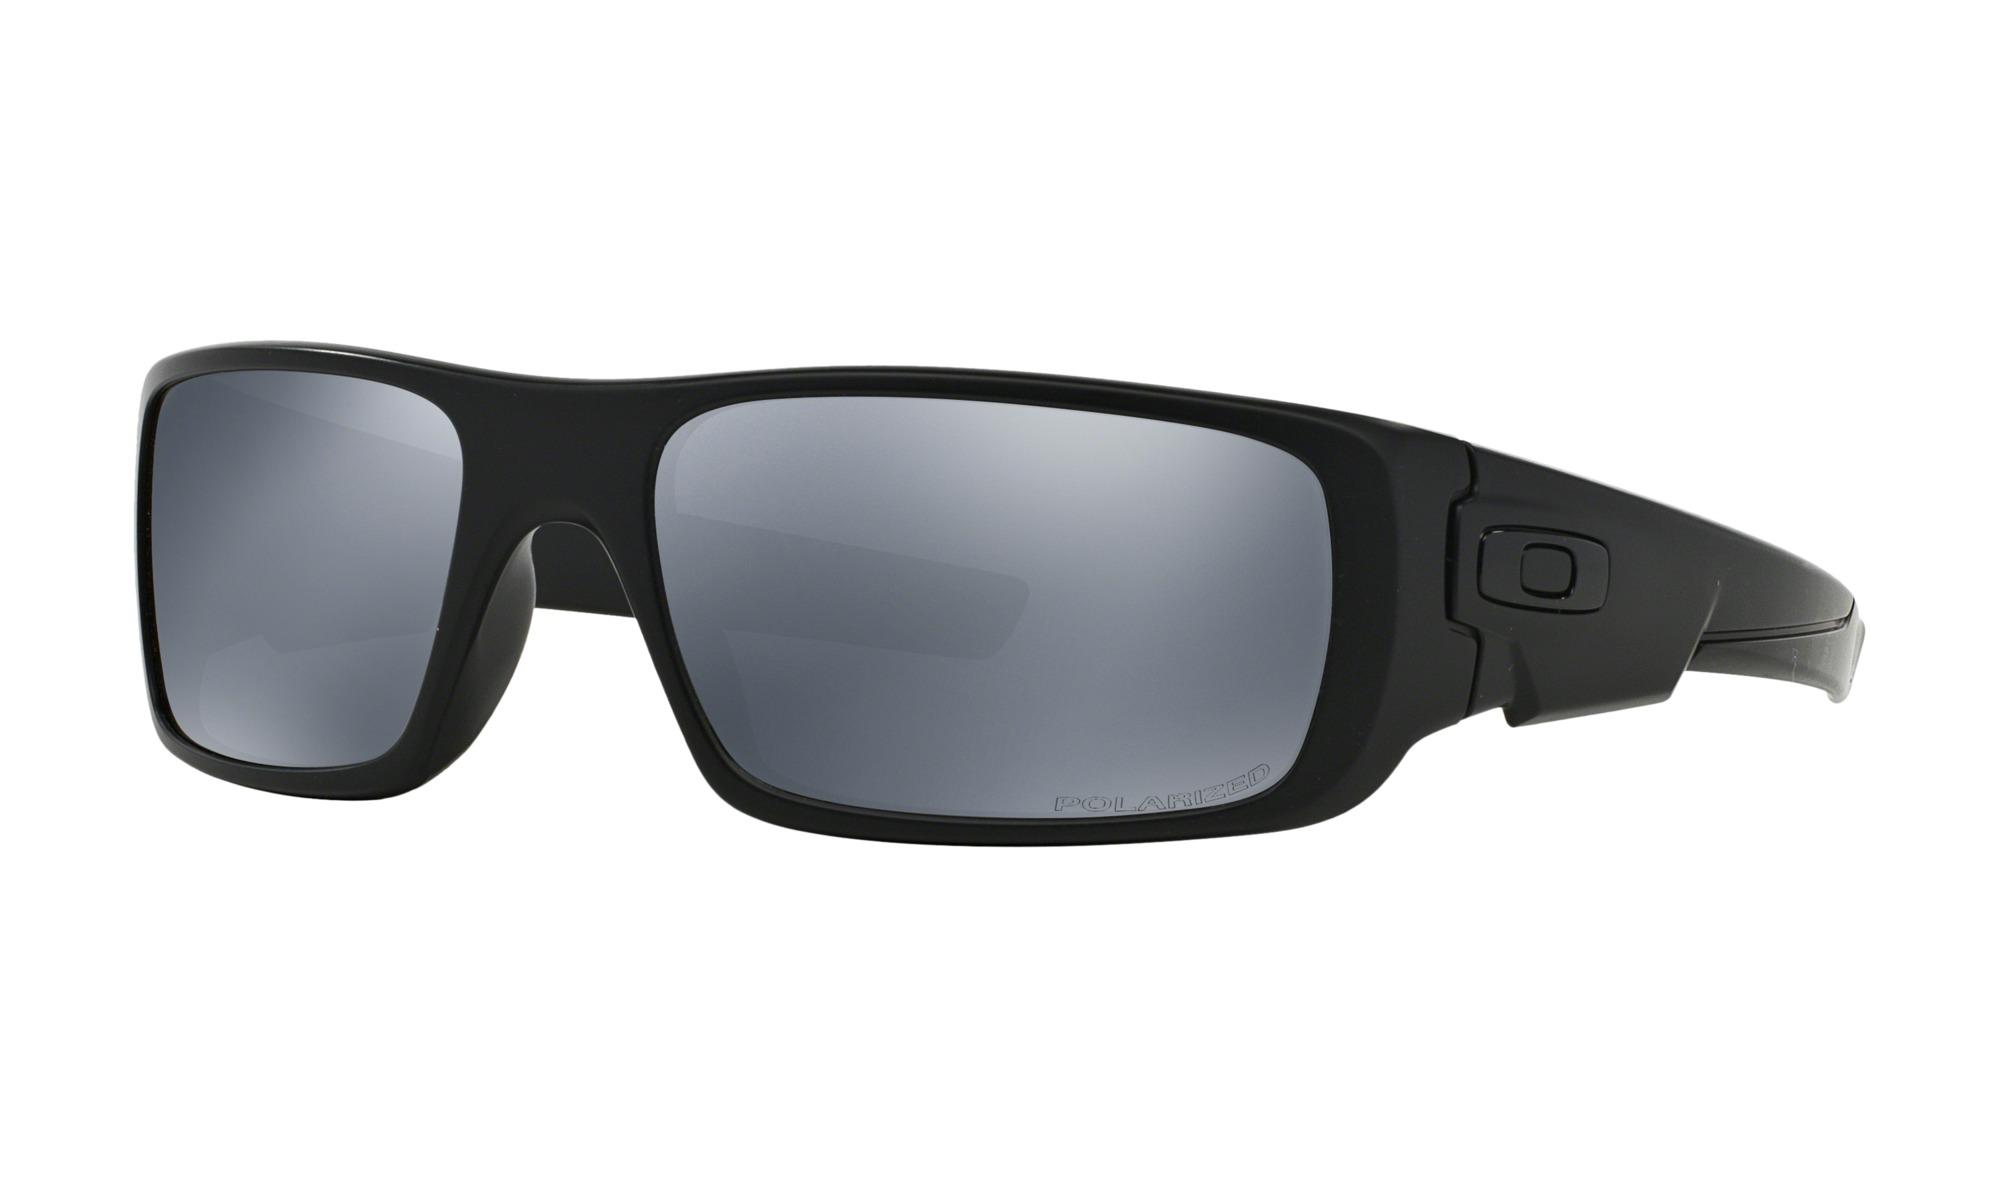 b32b170390d0 Oakley Crankshaft Men's Sunglasses – Matte Blk w/ Blk Iridium Polarized Lens